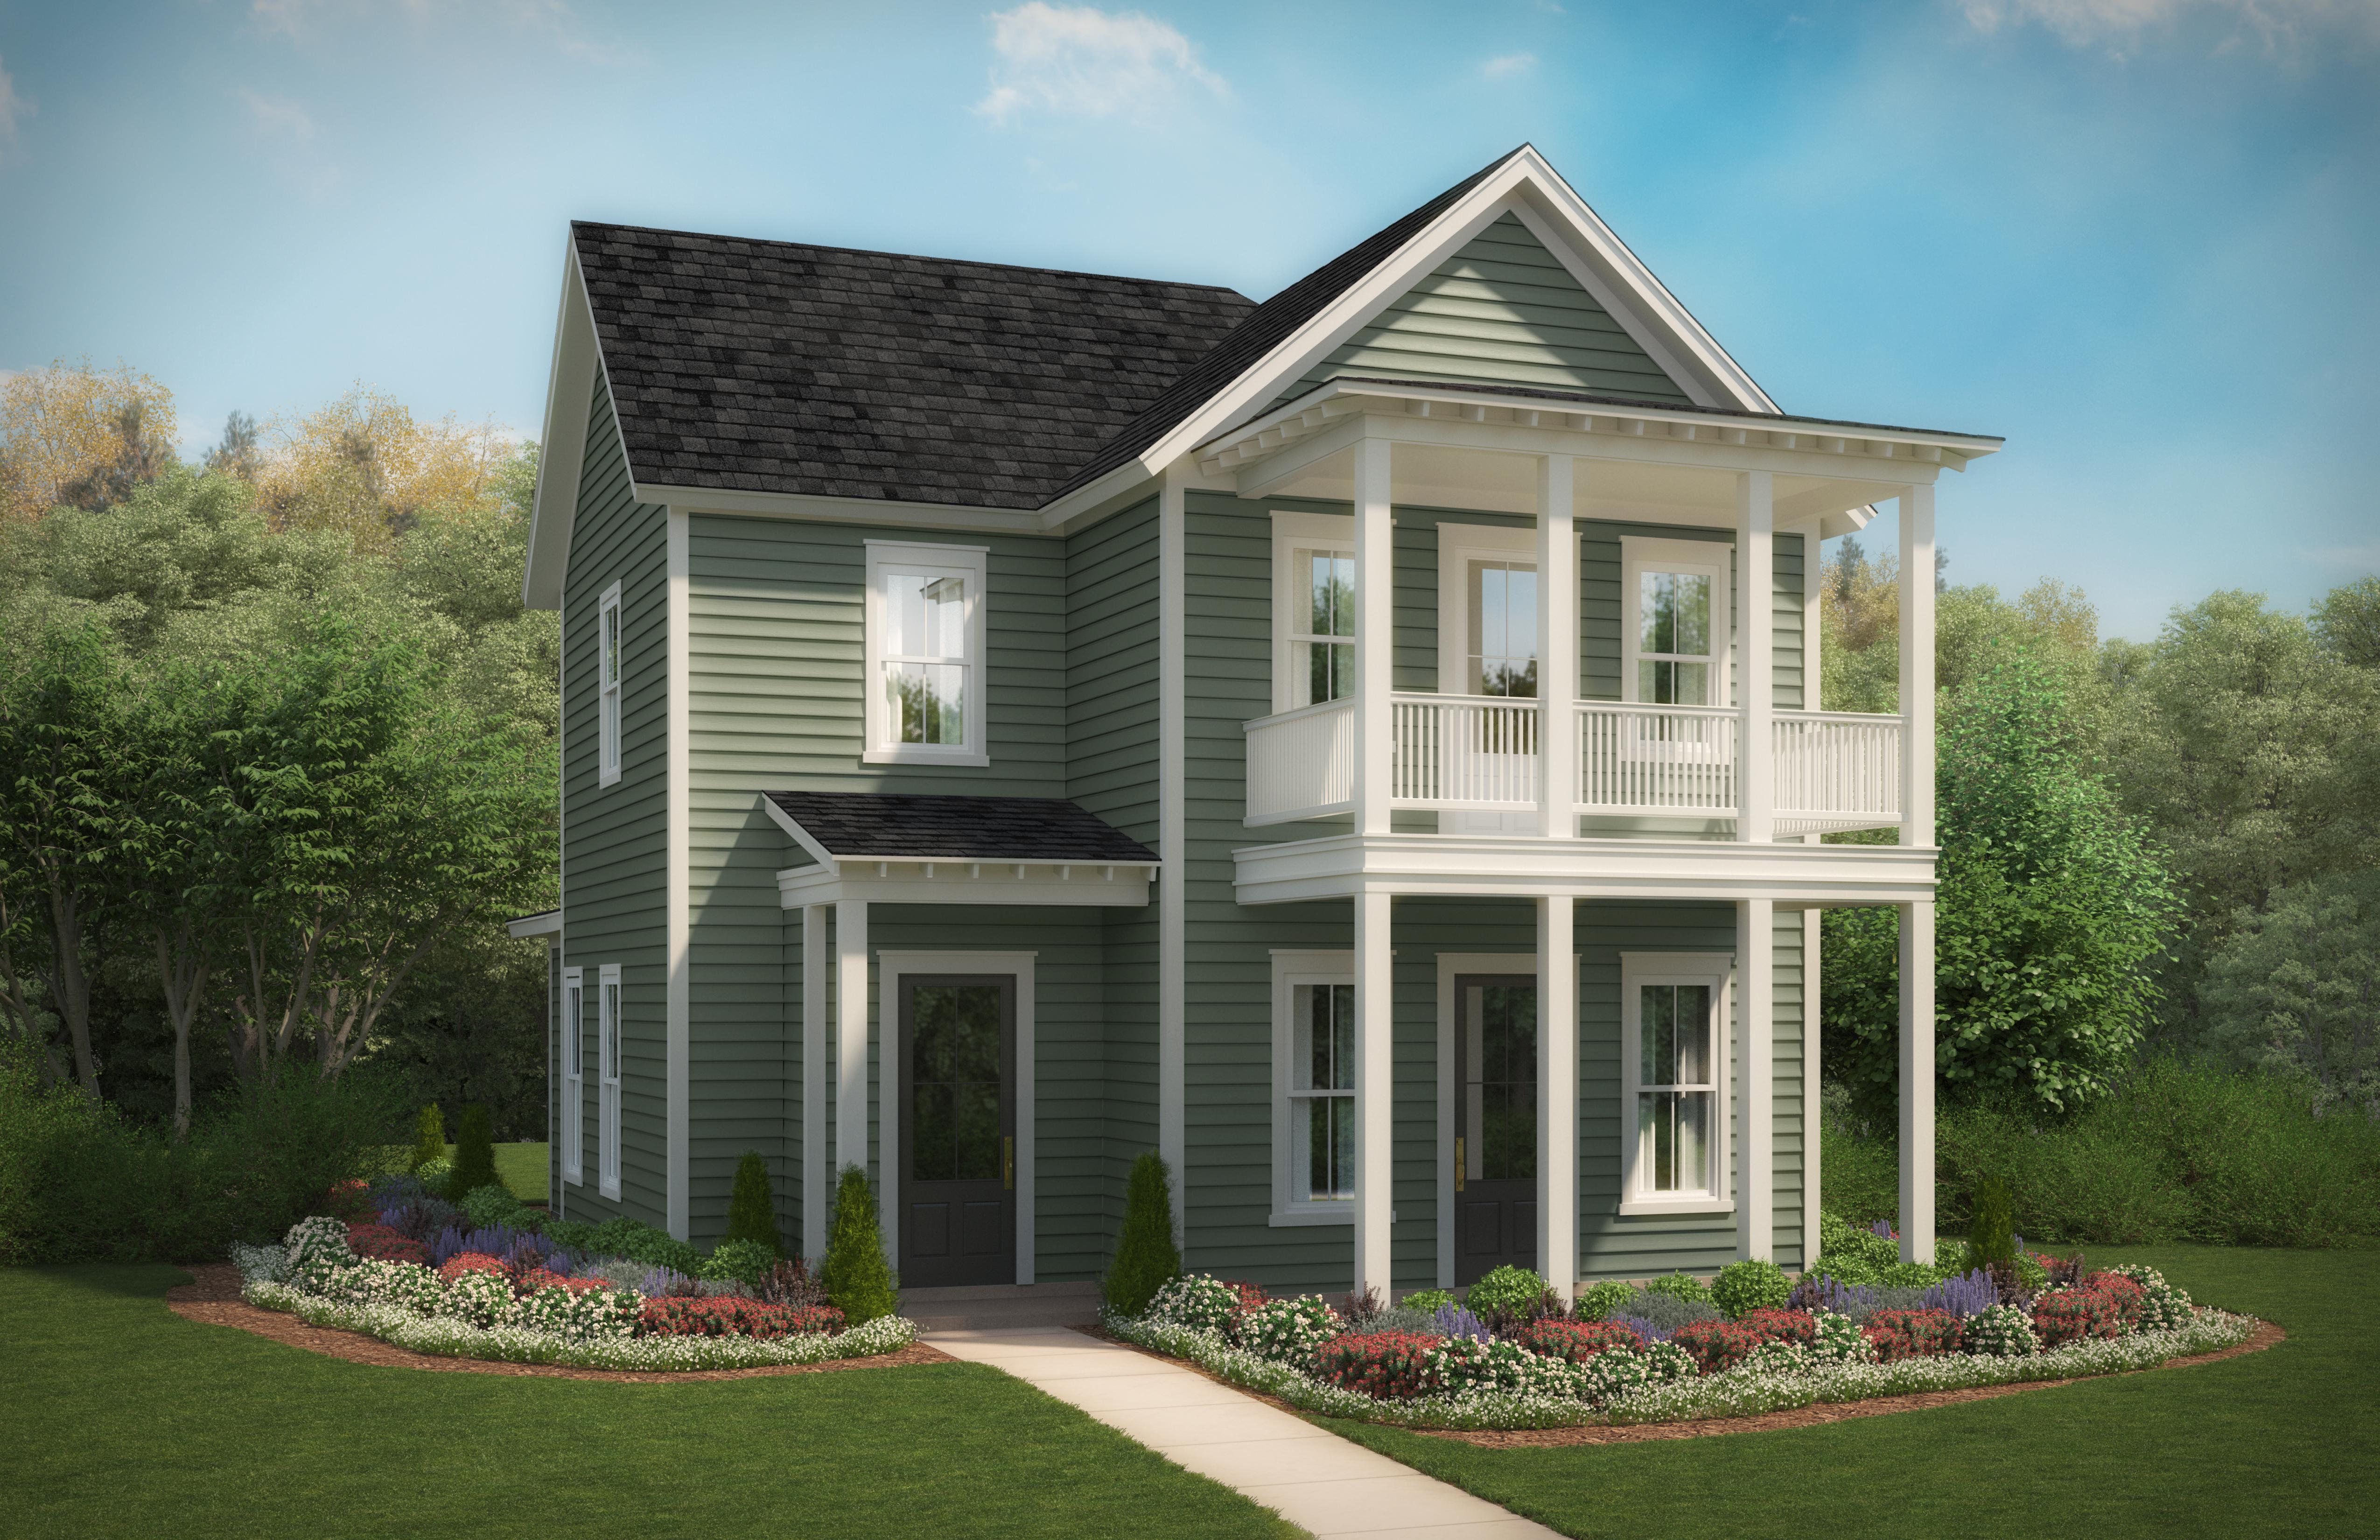 Azalea Plan by Stanley Martin Homes, New Homes in South Carolina